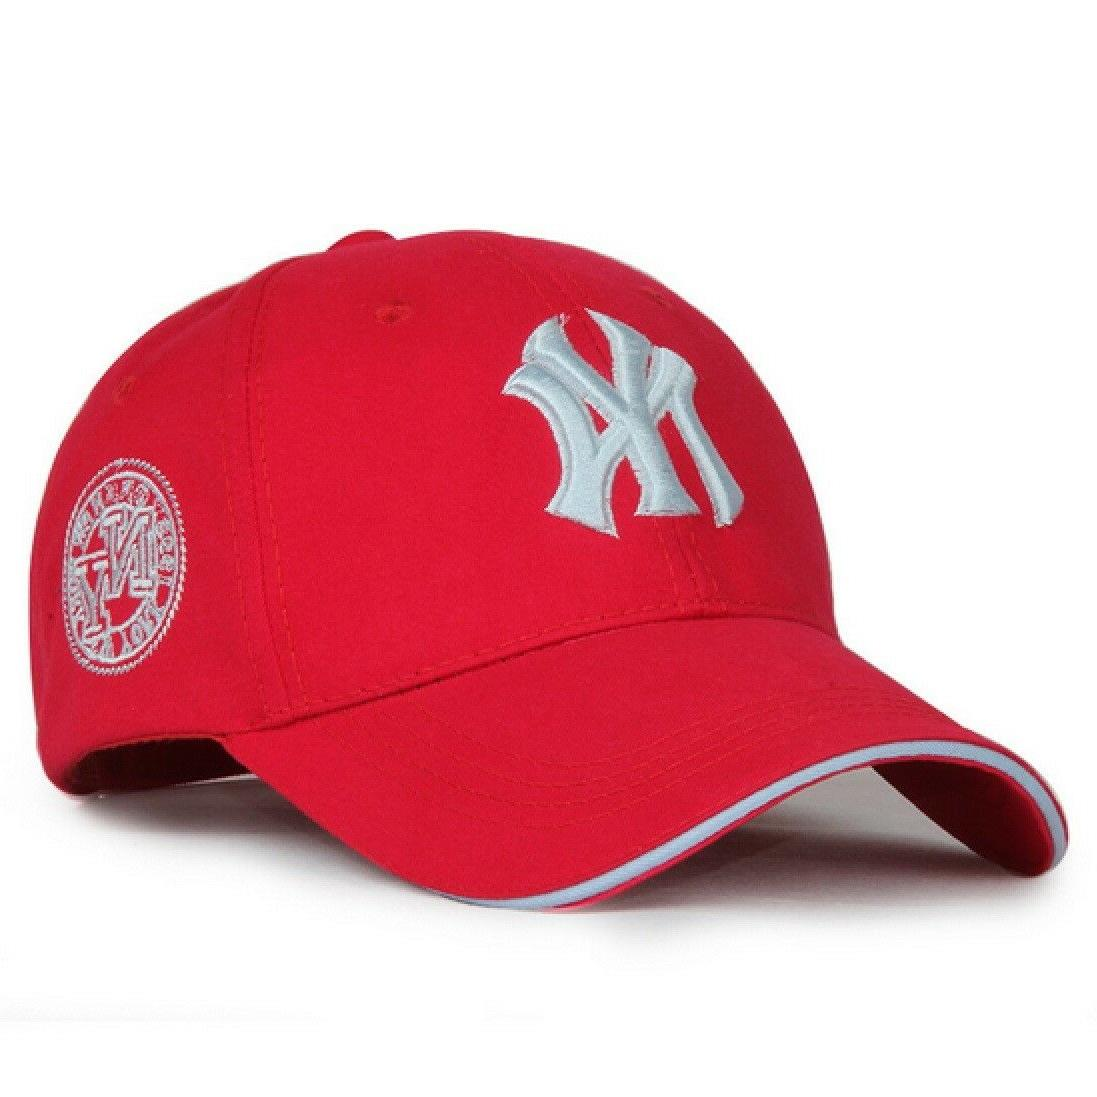 Baseball Cap Yankees Hat Unisex